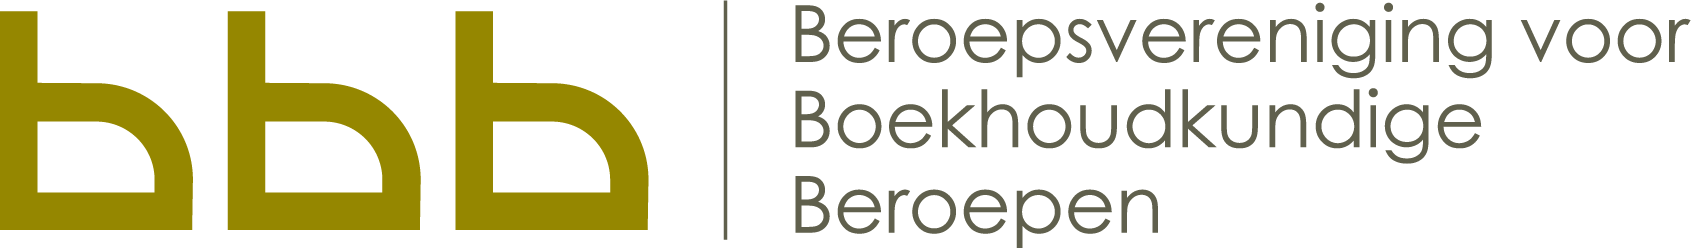 BBB_logo met tekst-1